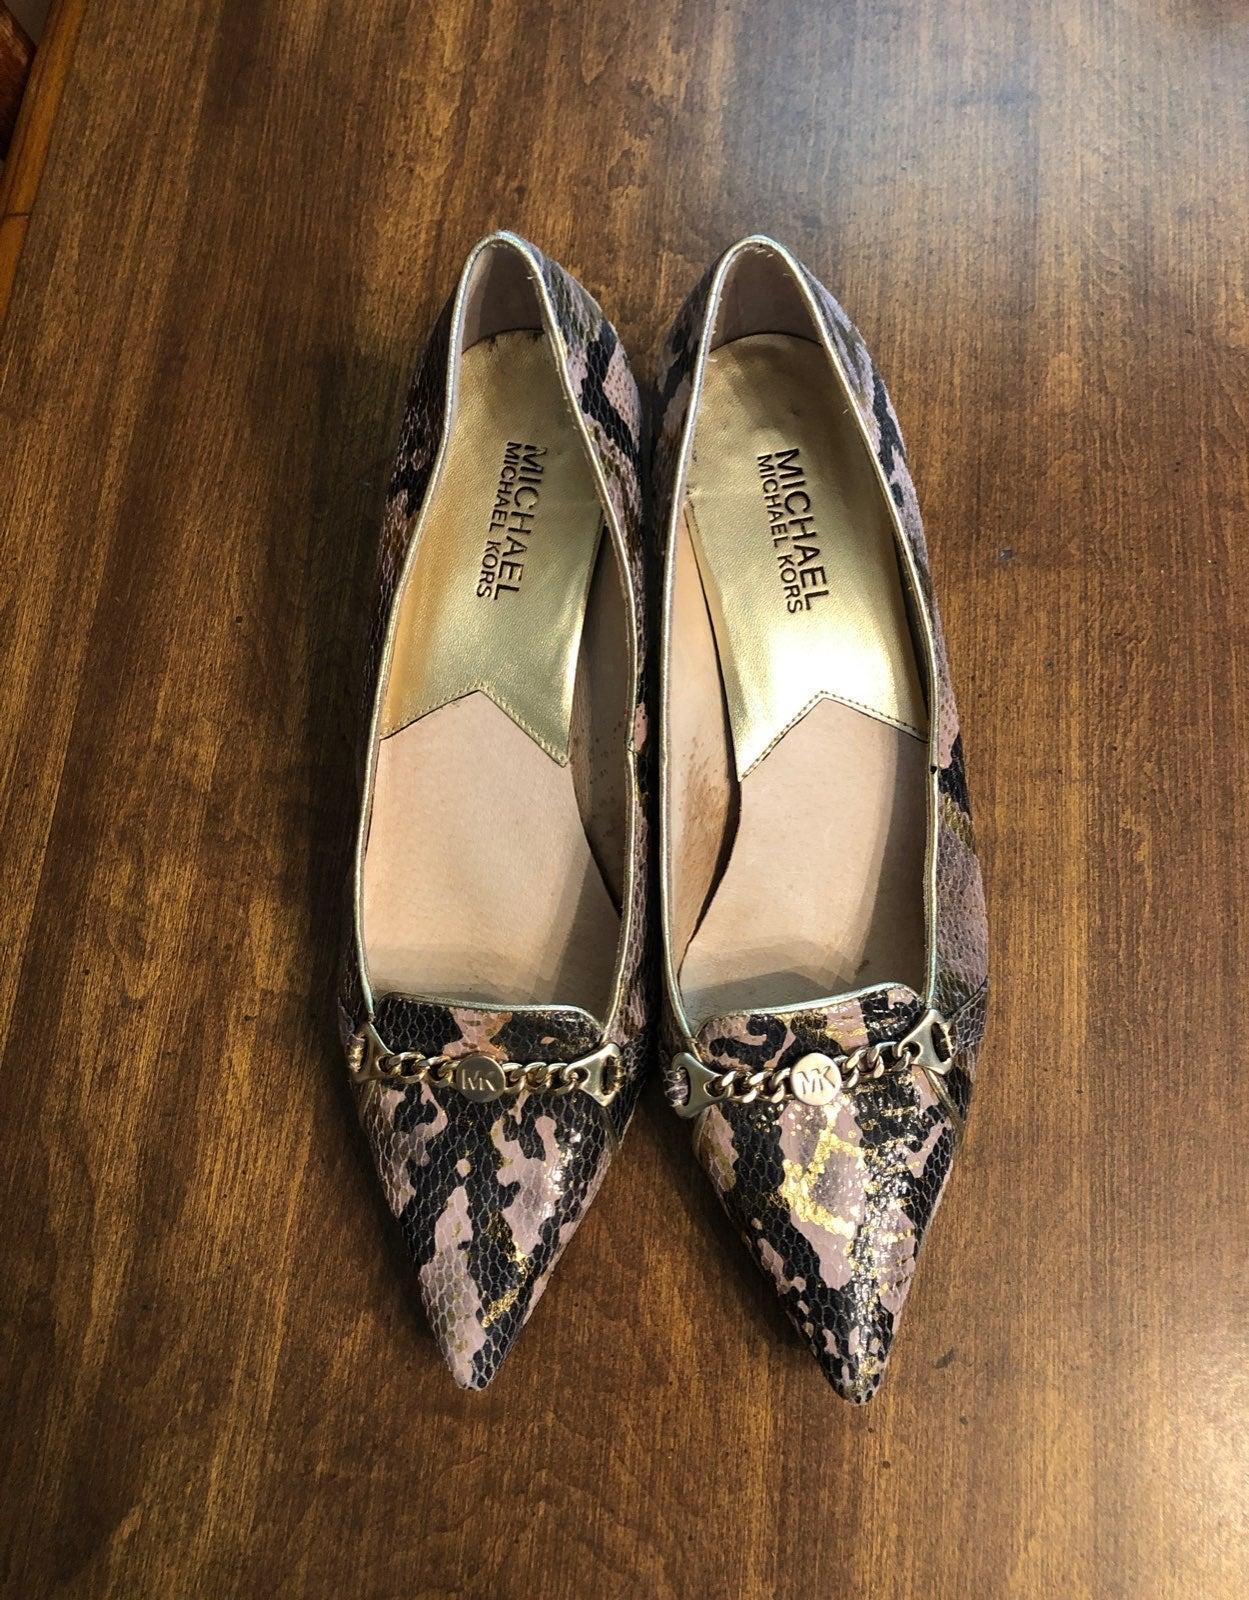 Michael Kors snake skin heels. Size 8.5